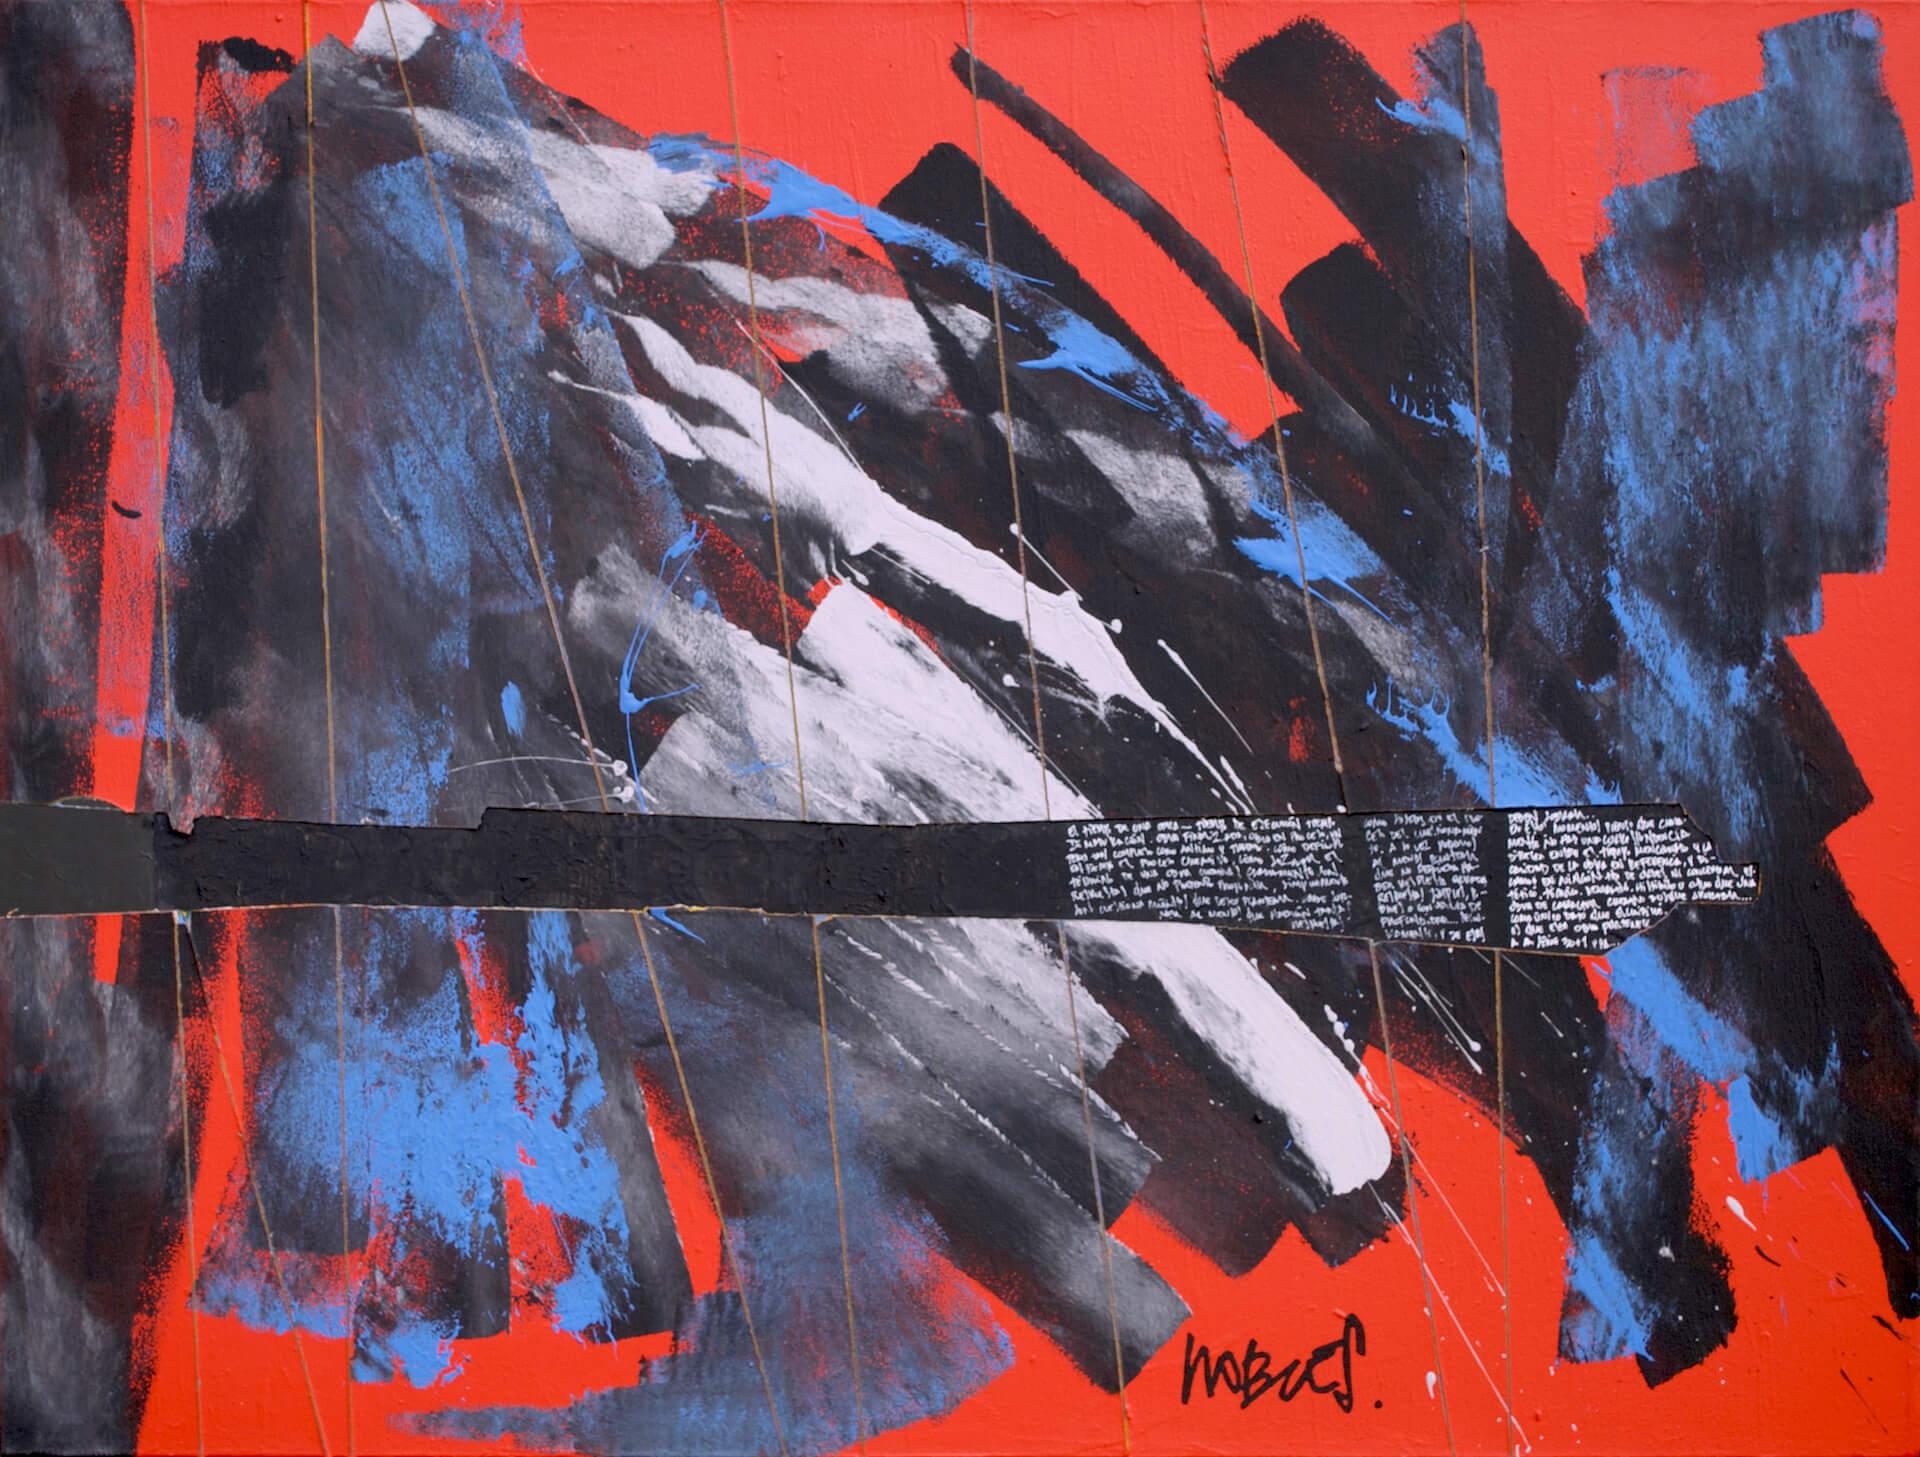 HERIDA ESCRITA, 2019, acrylic, 90 x 120 cm, $925 US